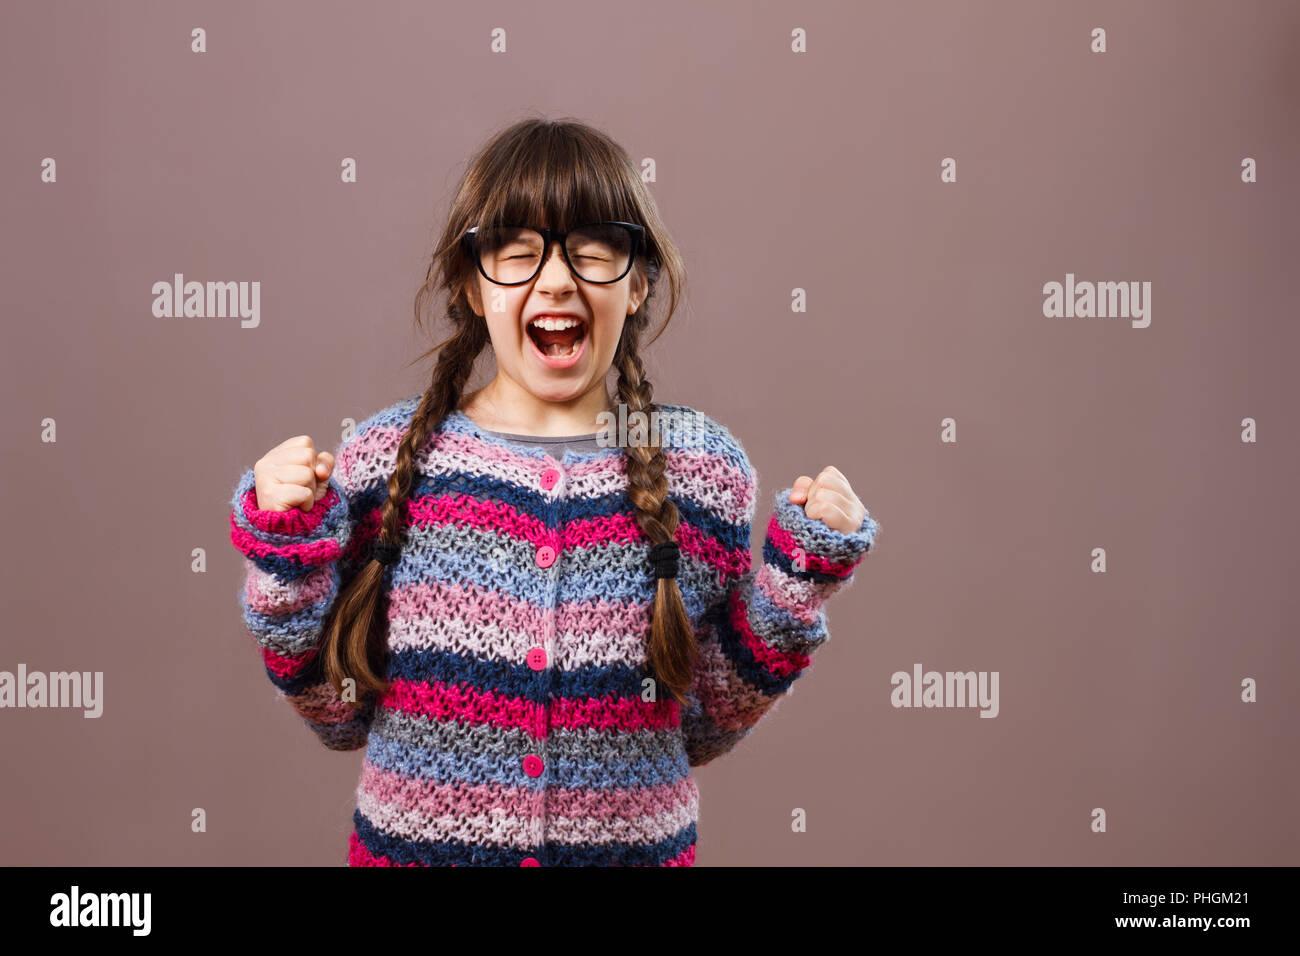 Angry little nerdy girl - Stock Image